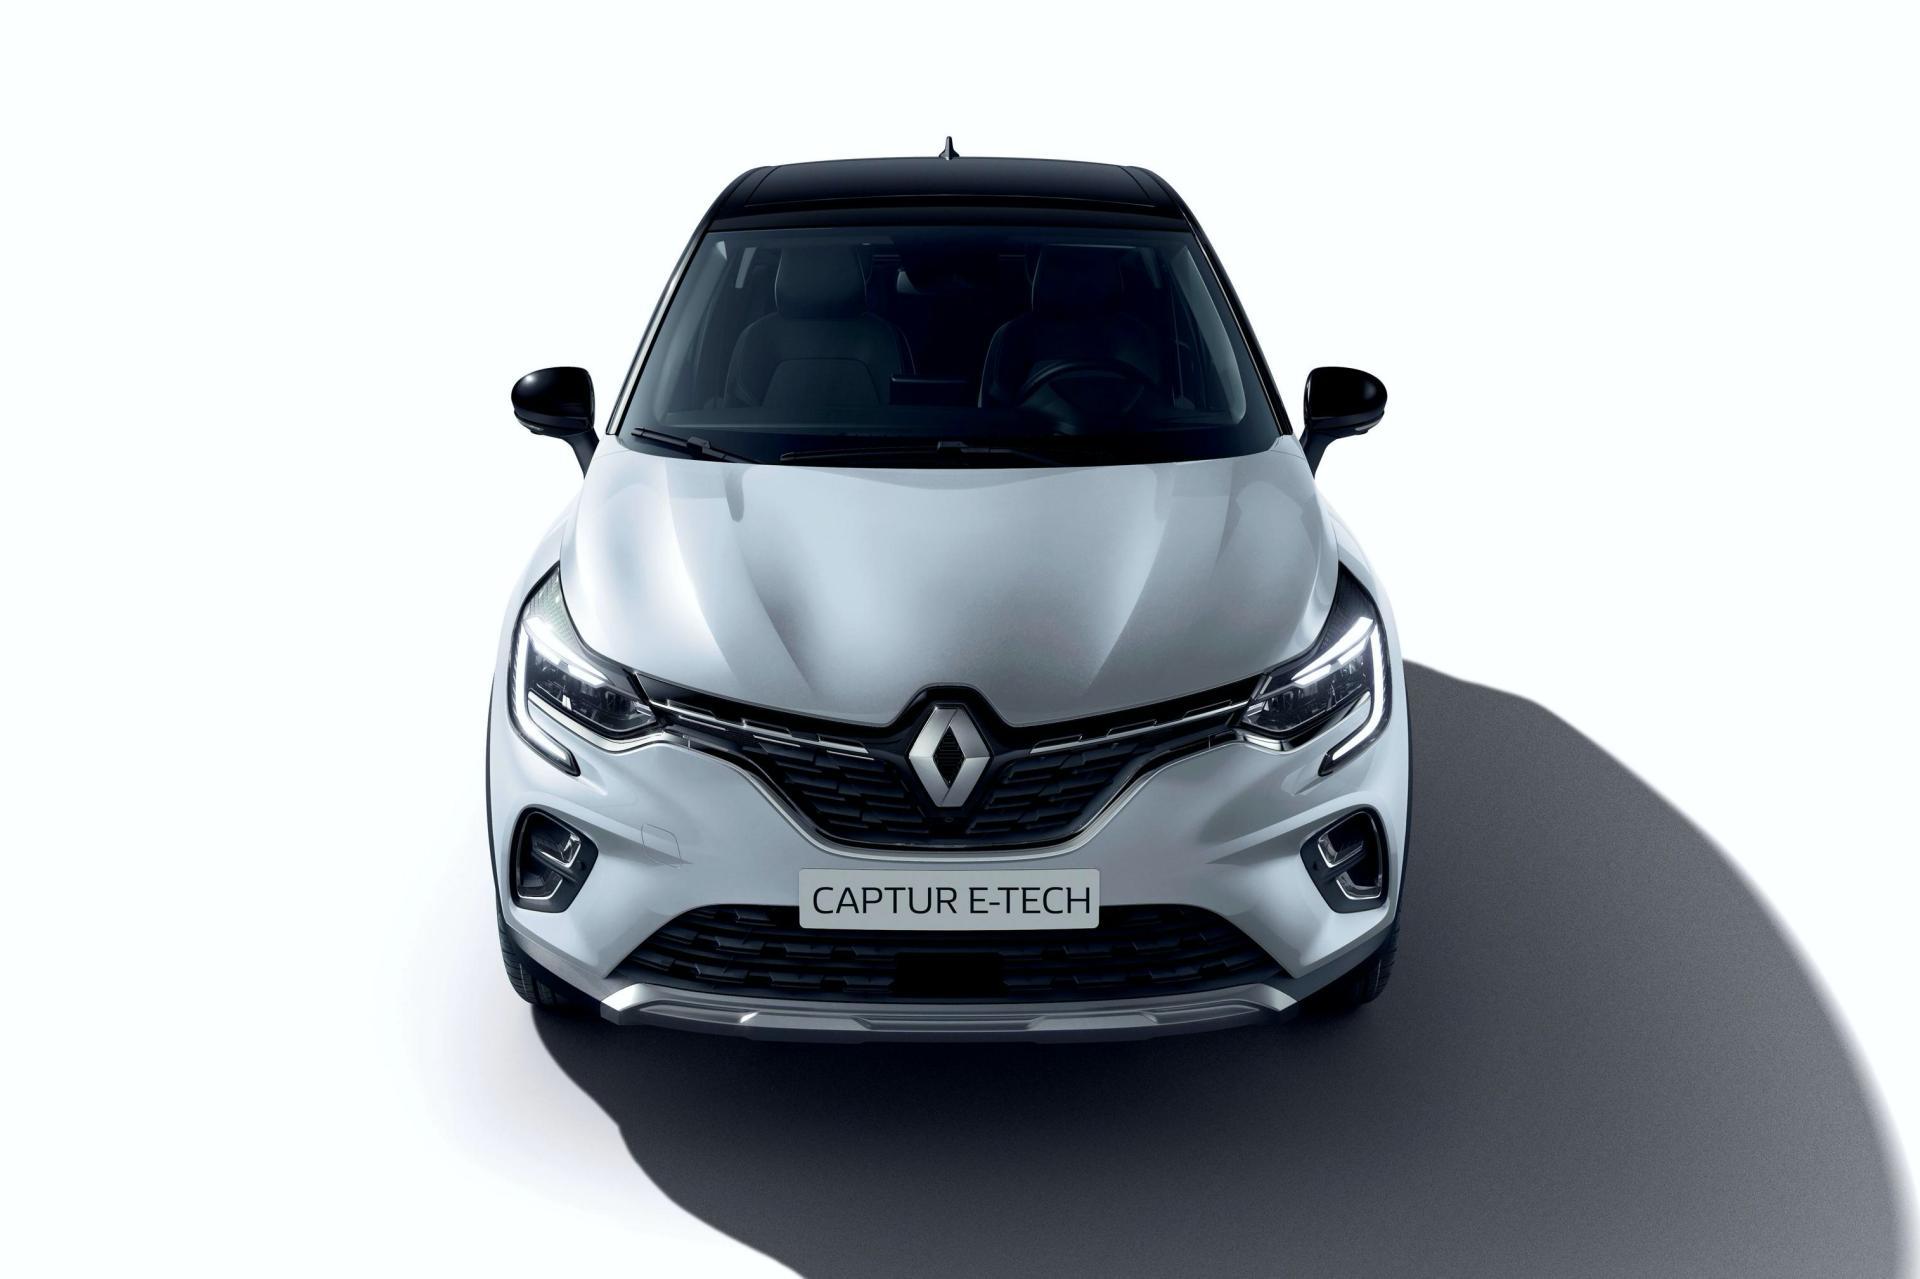 2020-Renault-Captur-E-Tech-plug-in-hybrid-10